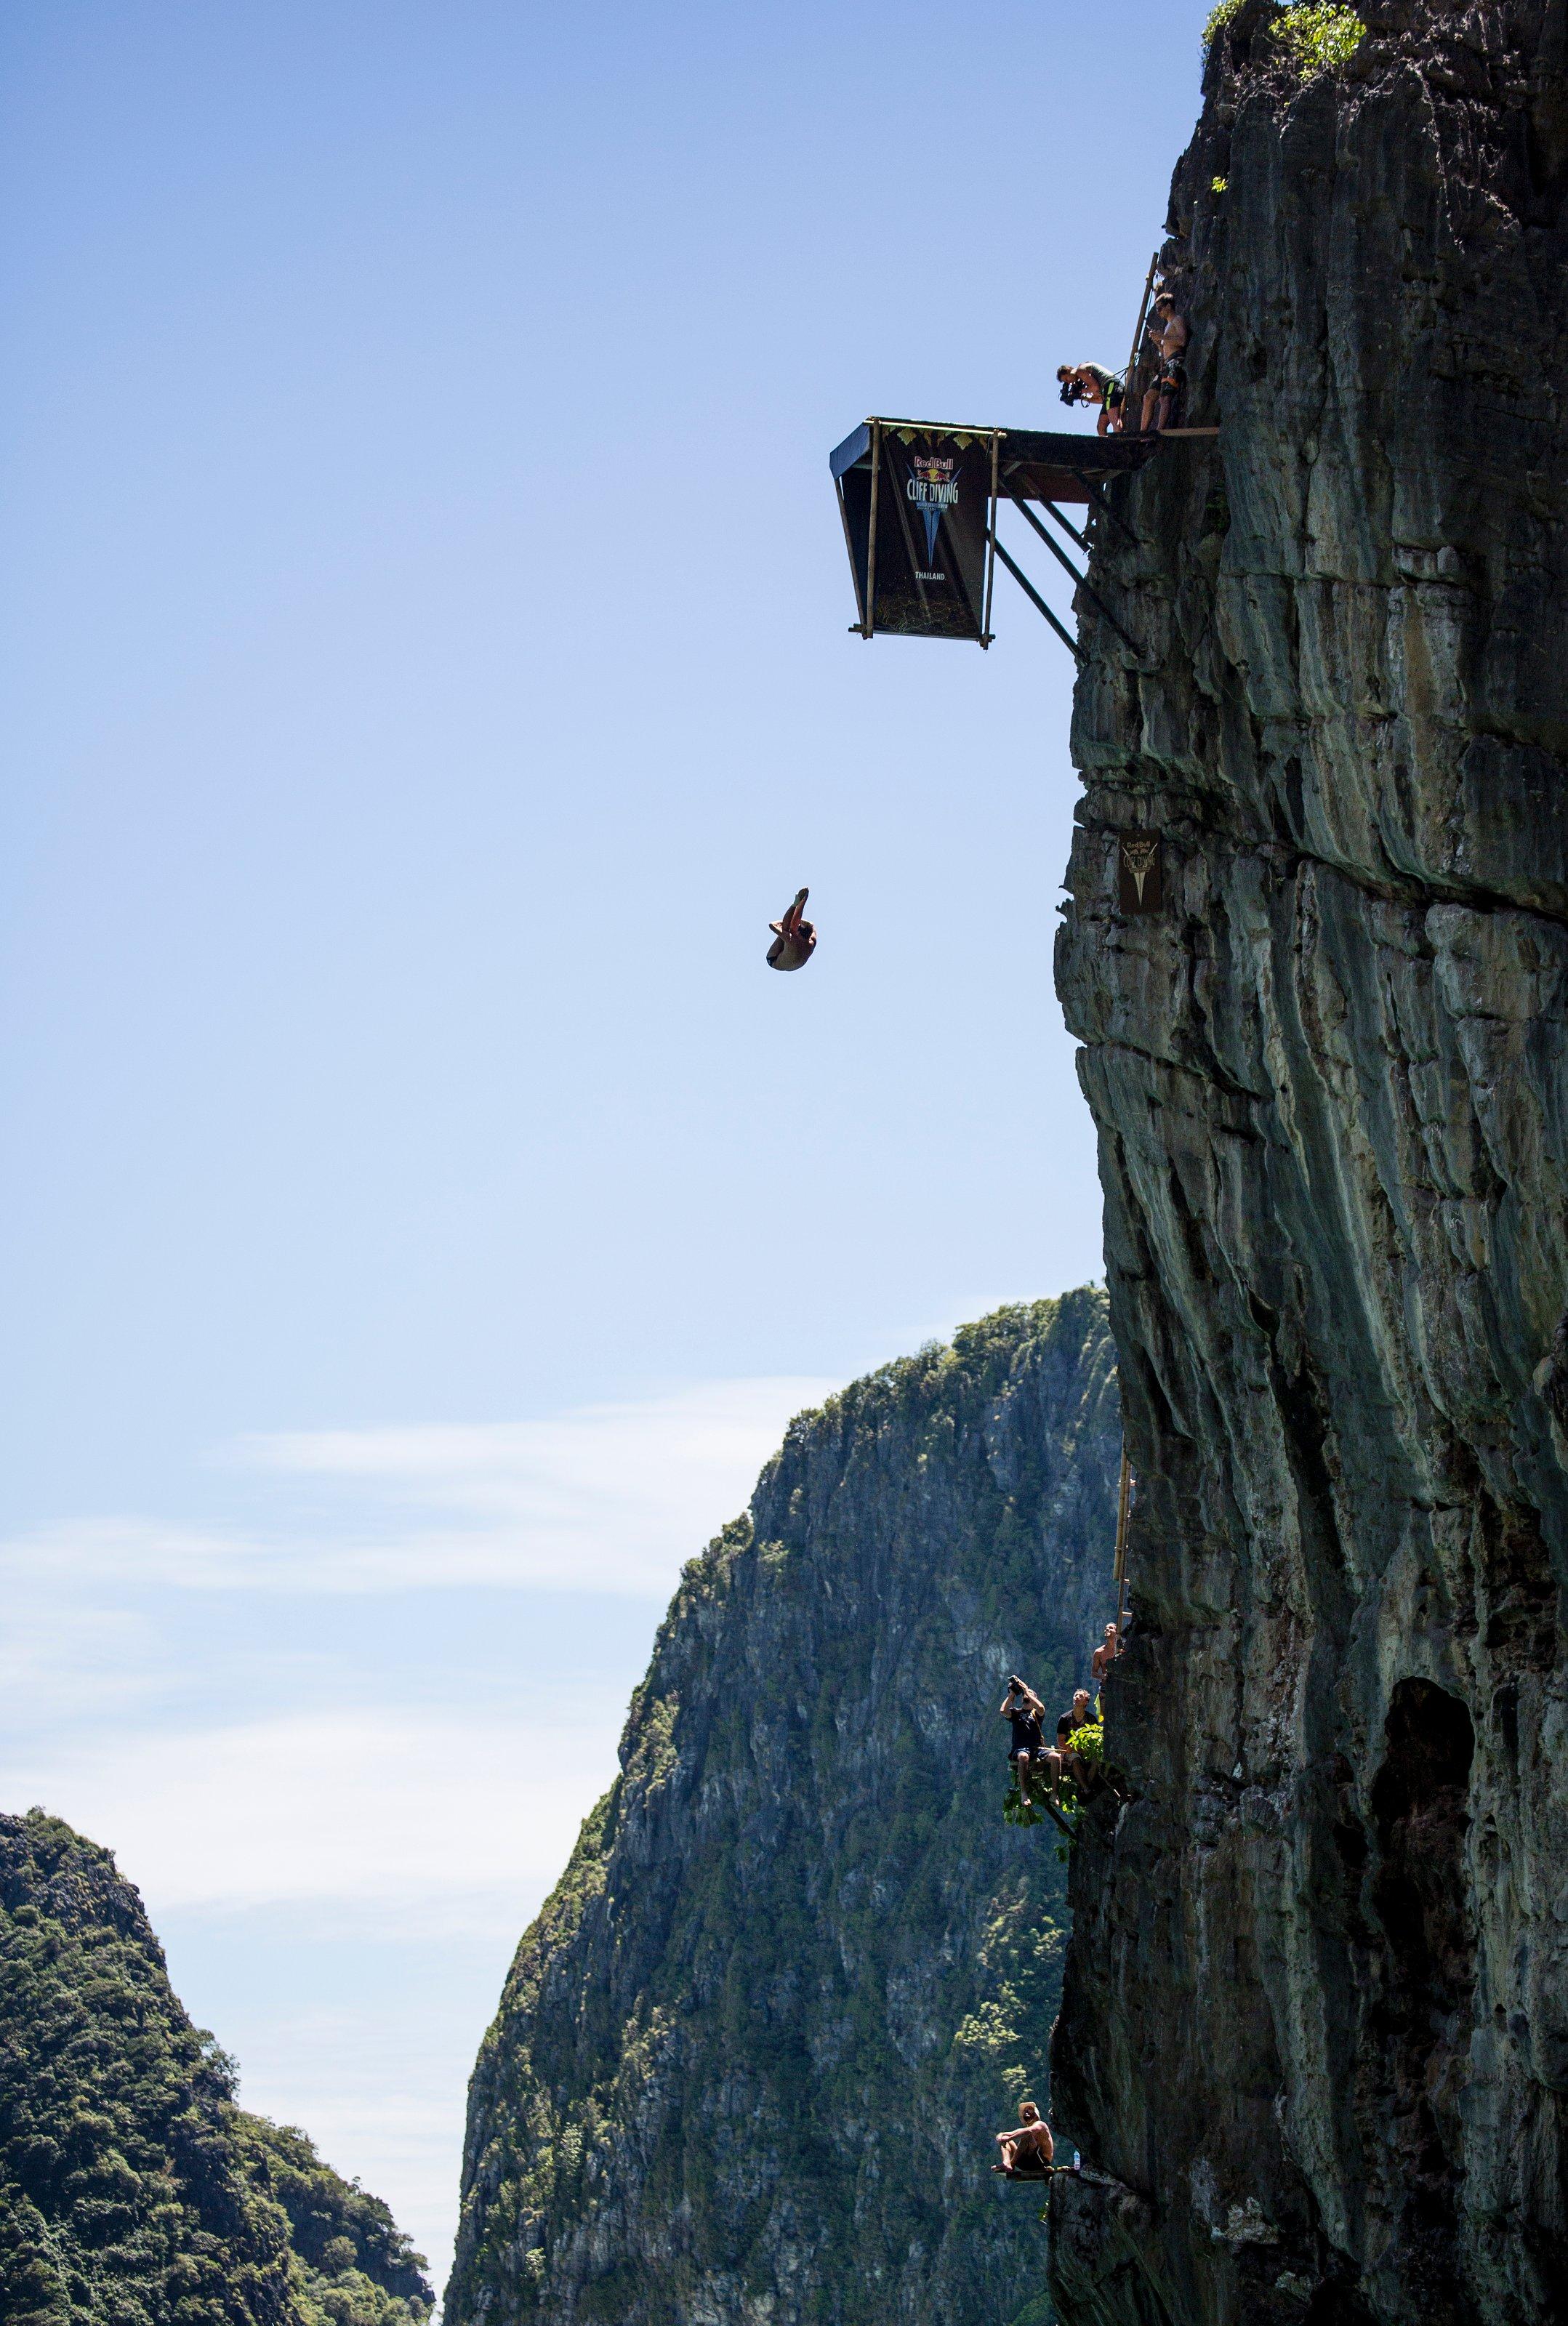 Blake Aldridge blog: Red Bull Cliff Diving World Series finishes on a high